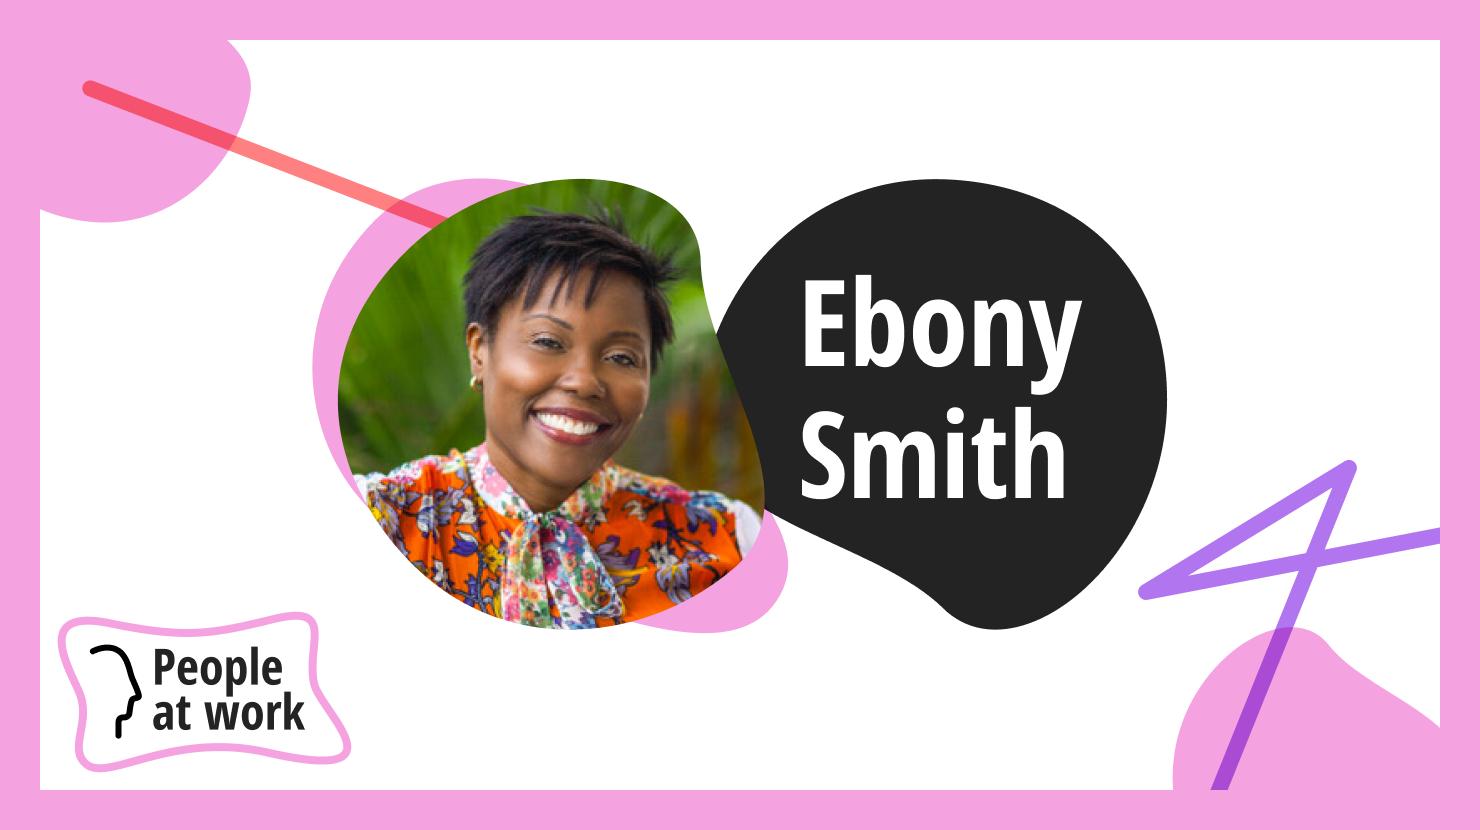 You can thrive in VUCA environments says Ebony Smith